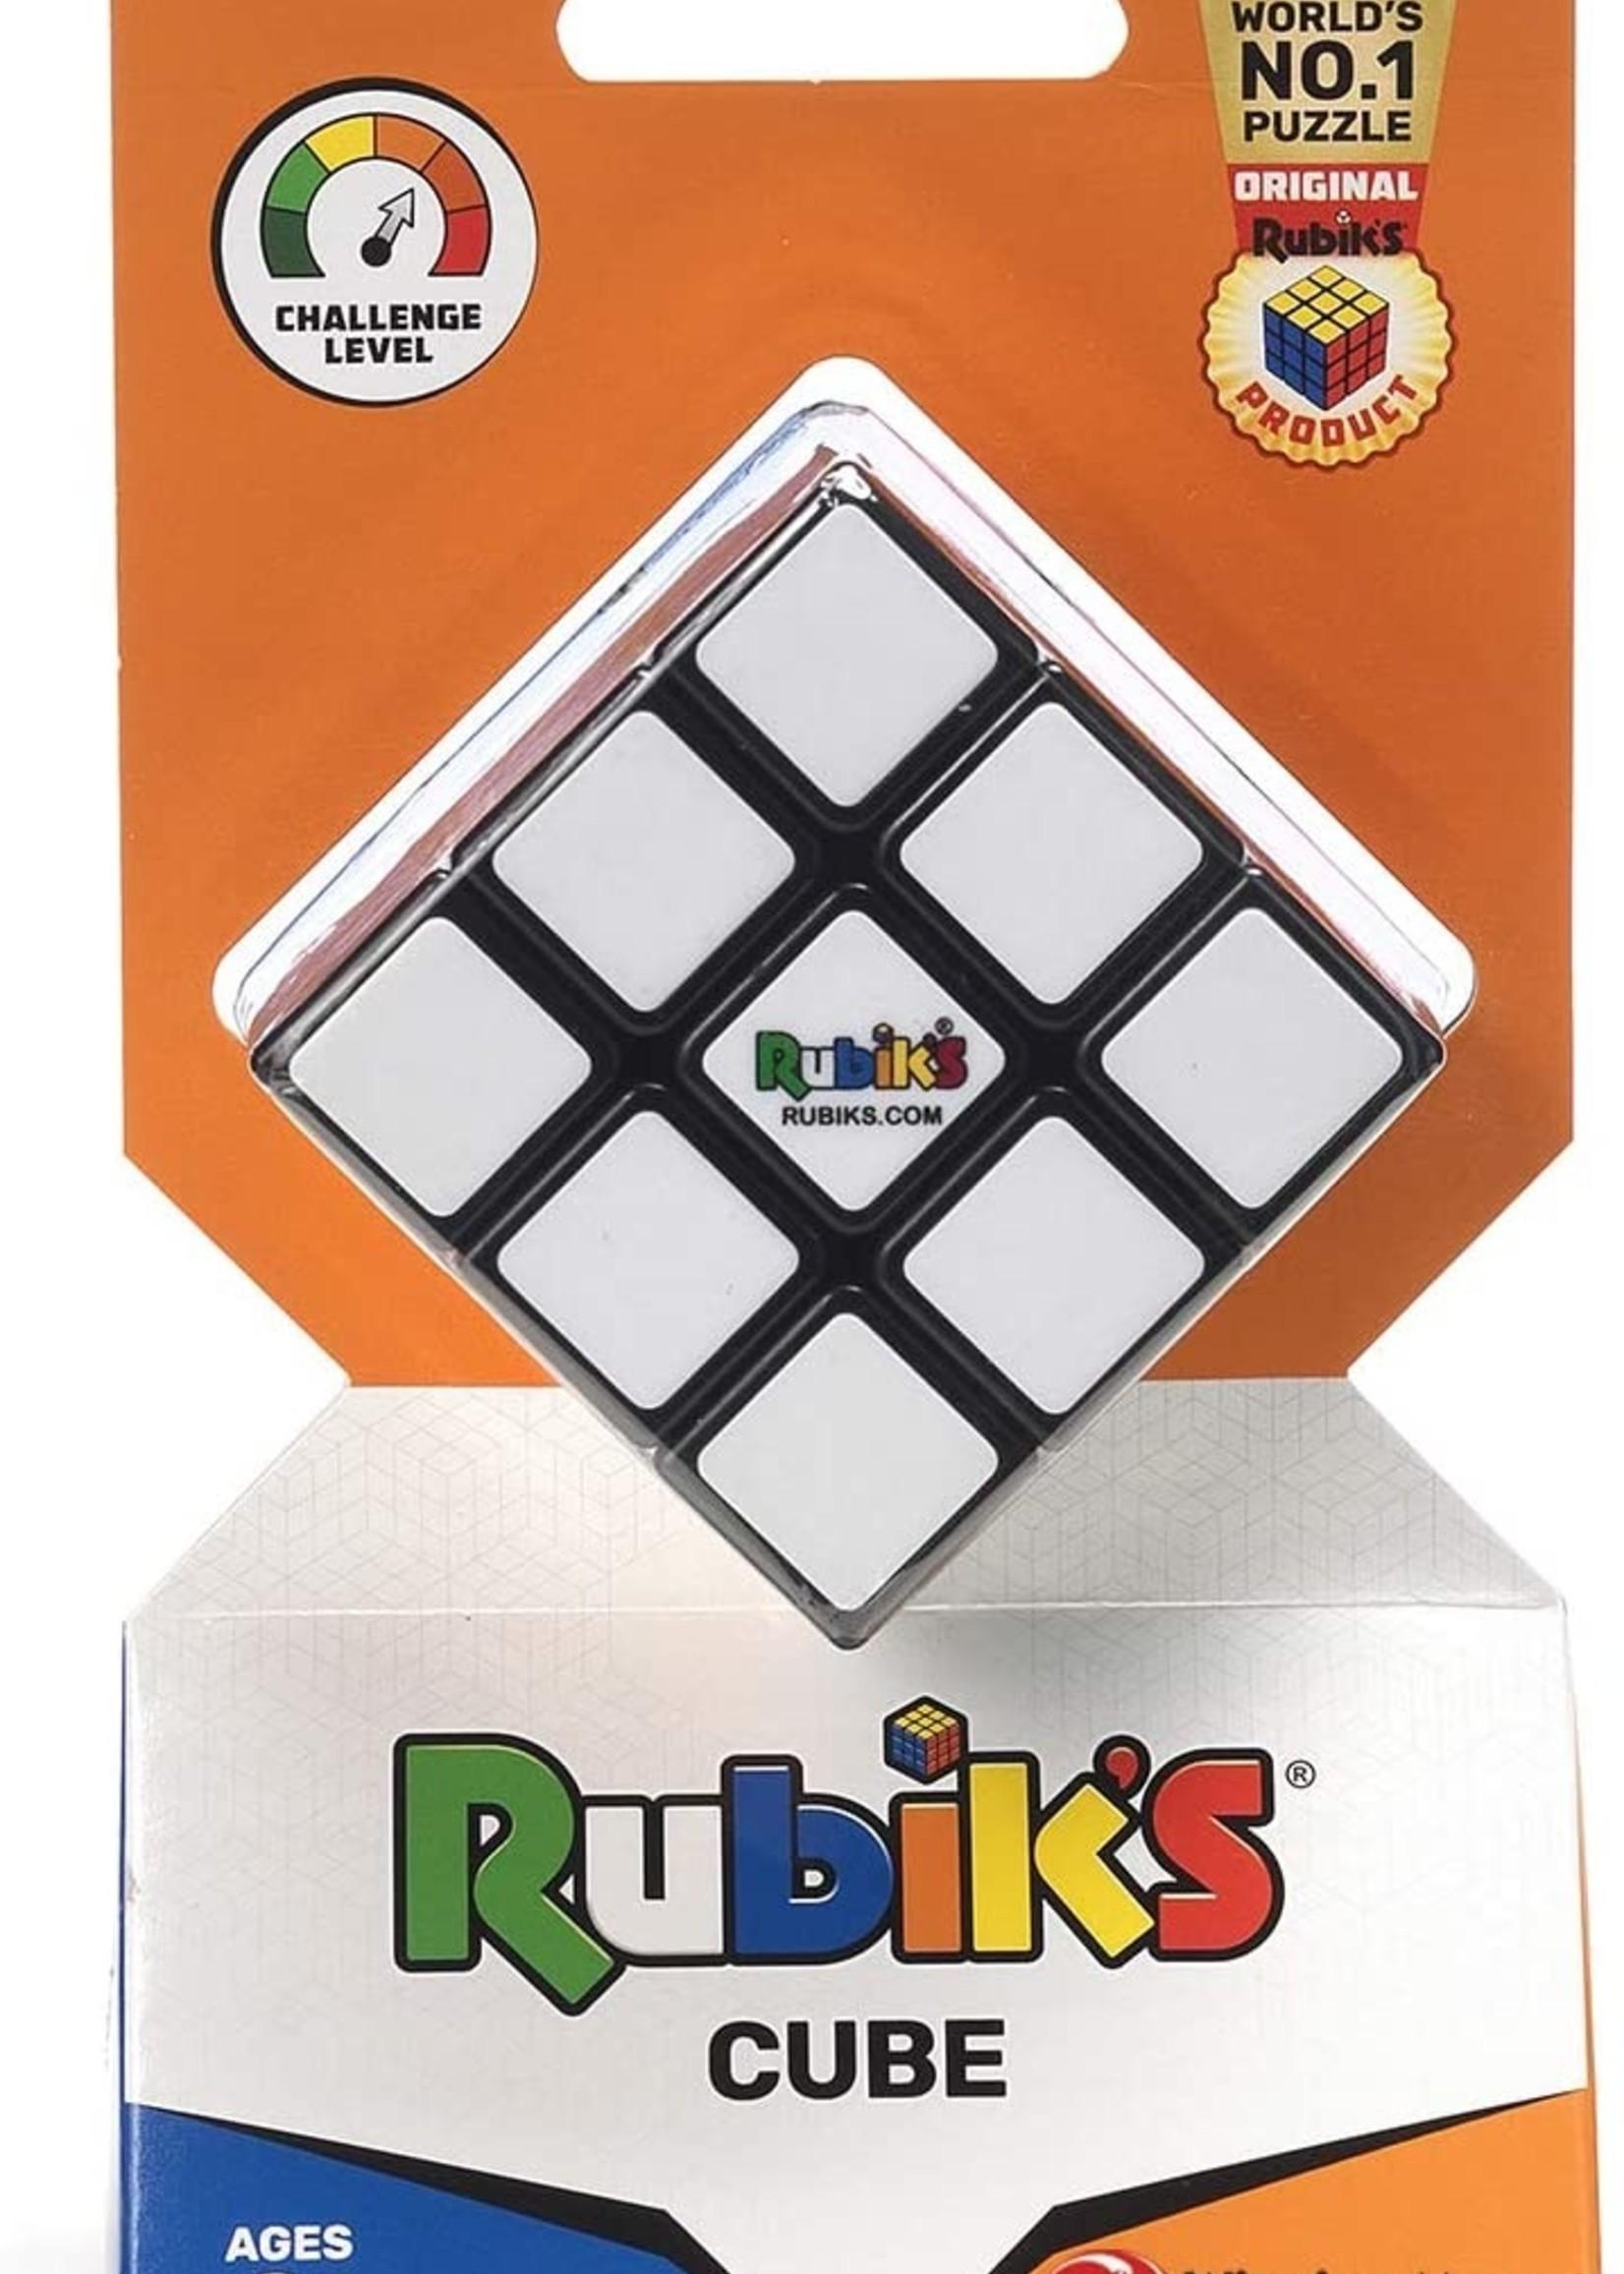 Rubiks Rubiks Cube Original